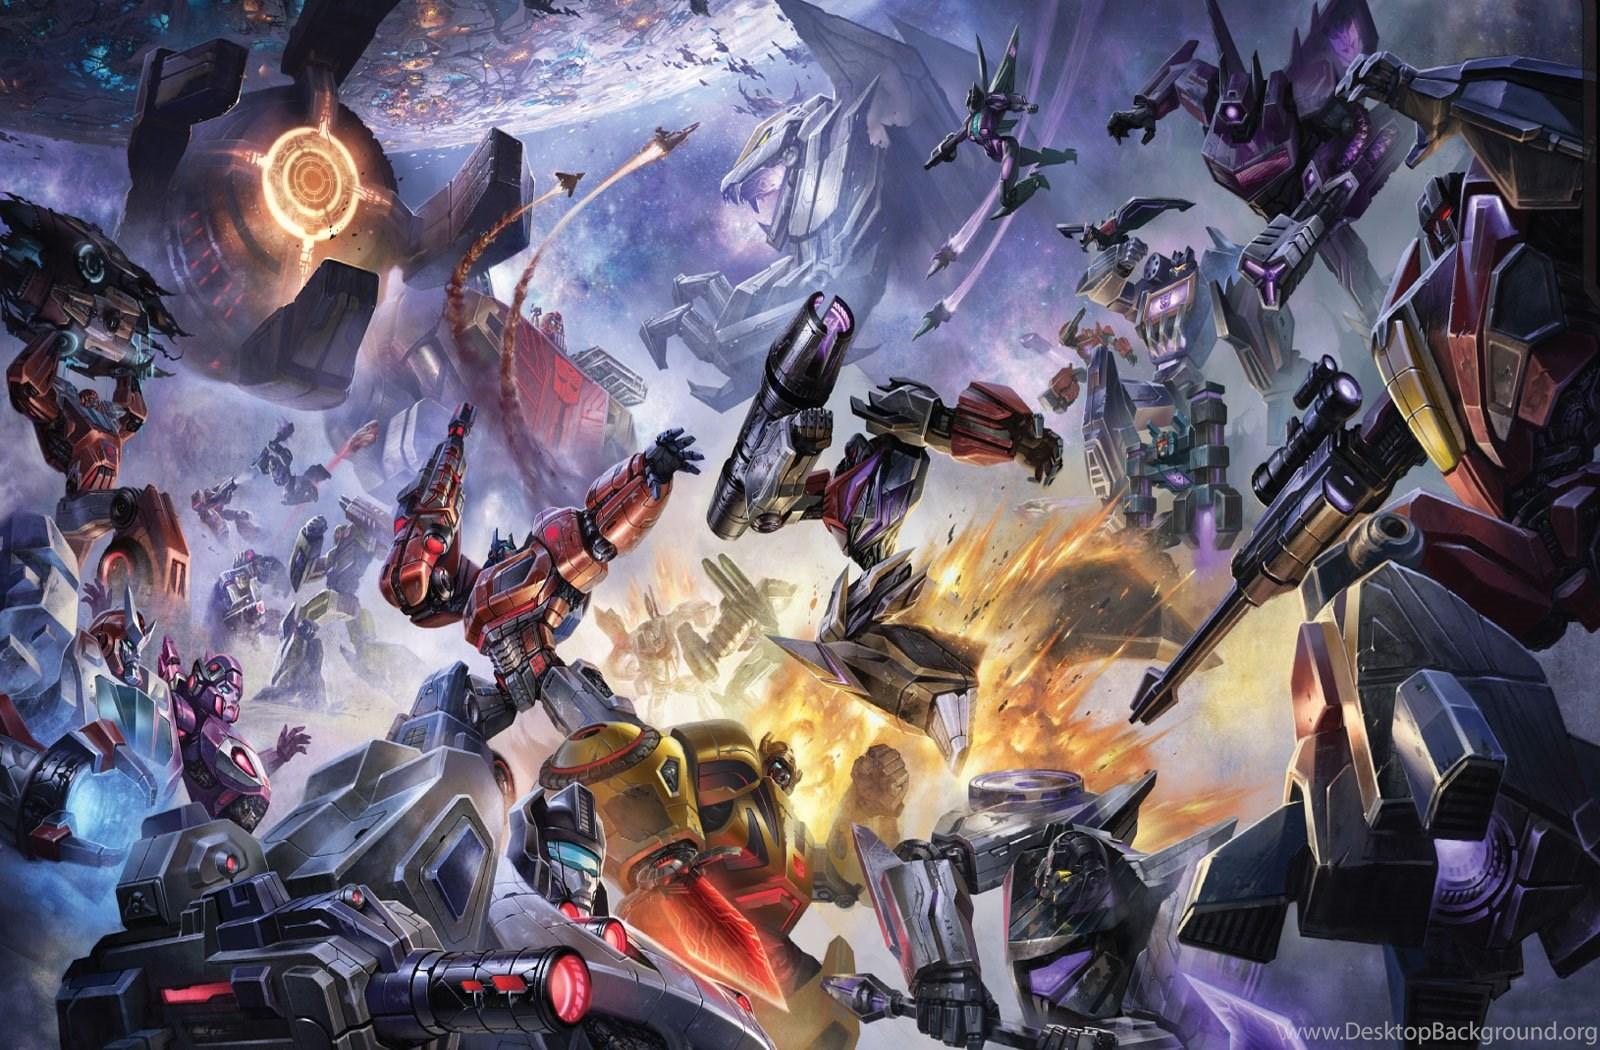 Image Transformers War For Cybertron Wallpaper 18 1 Jpg